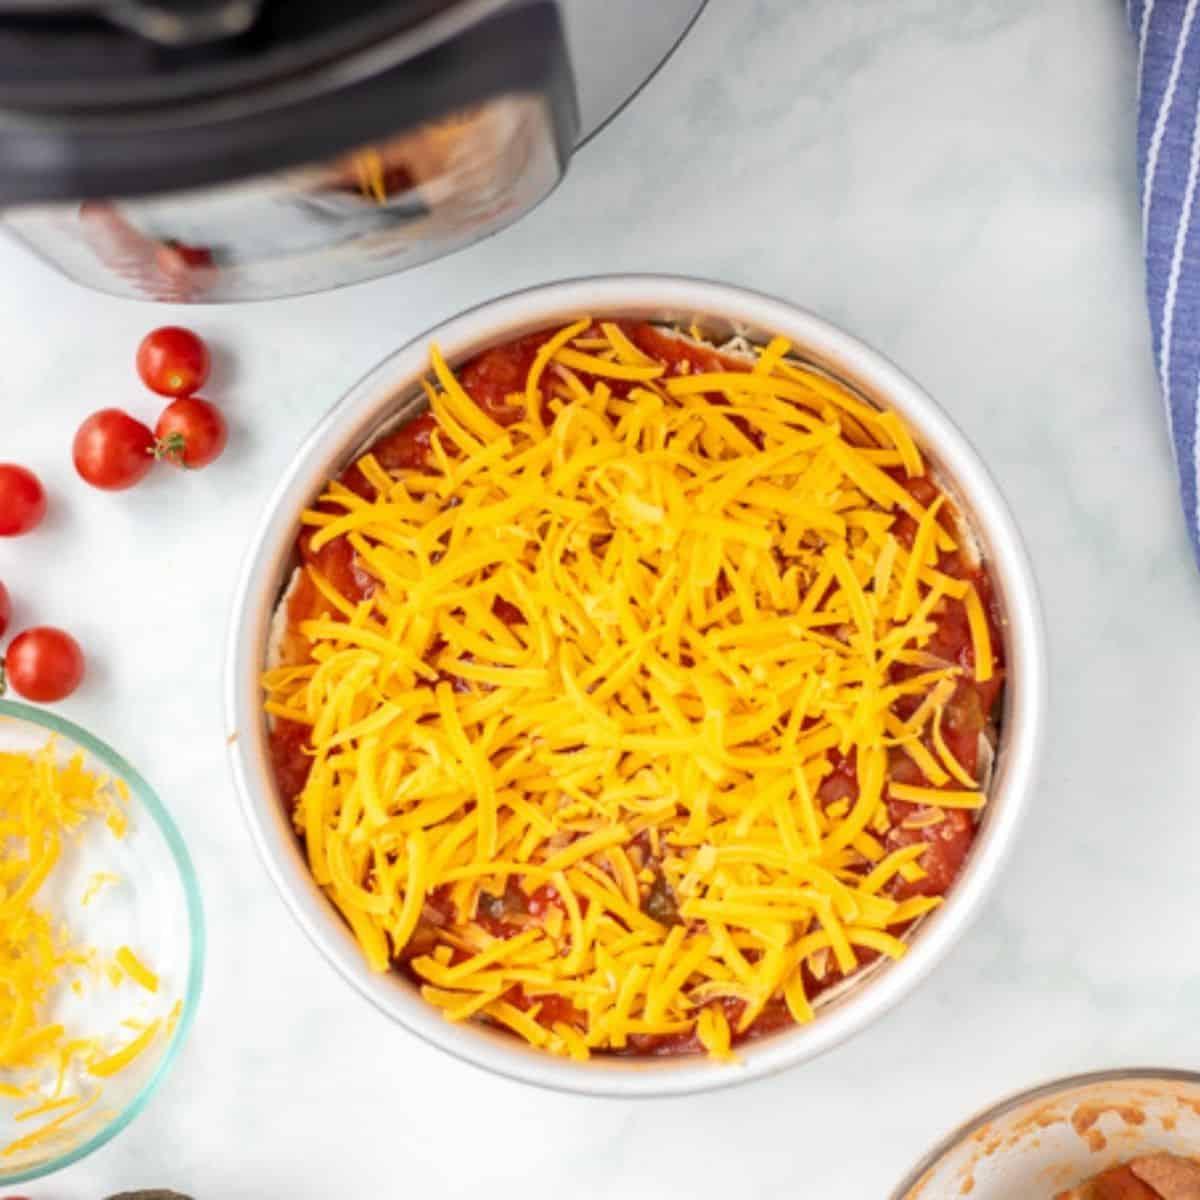 Assembled Taco Lasagna in cake pan next to instant pot.